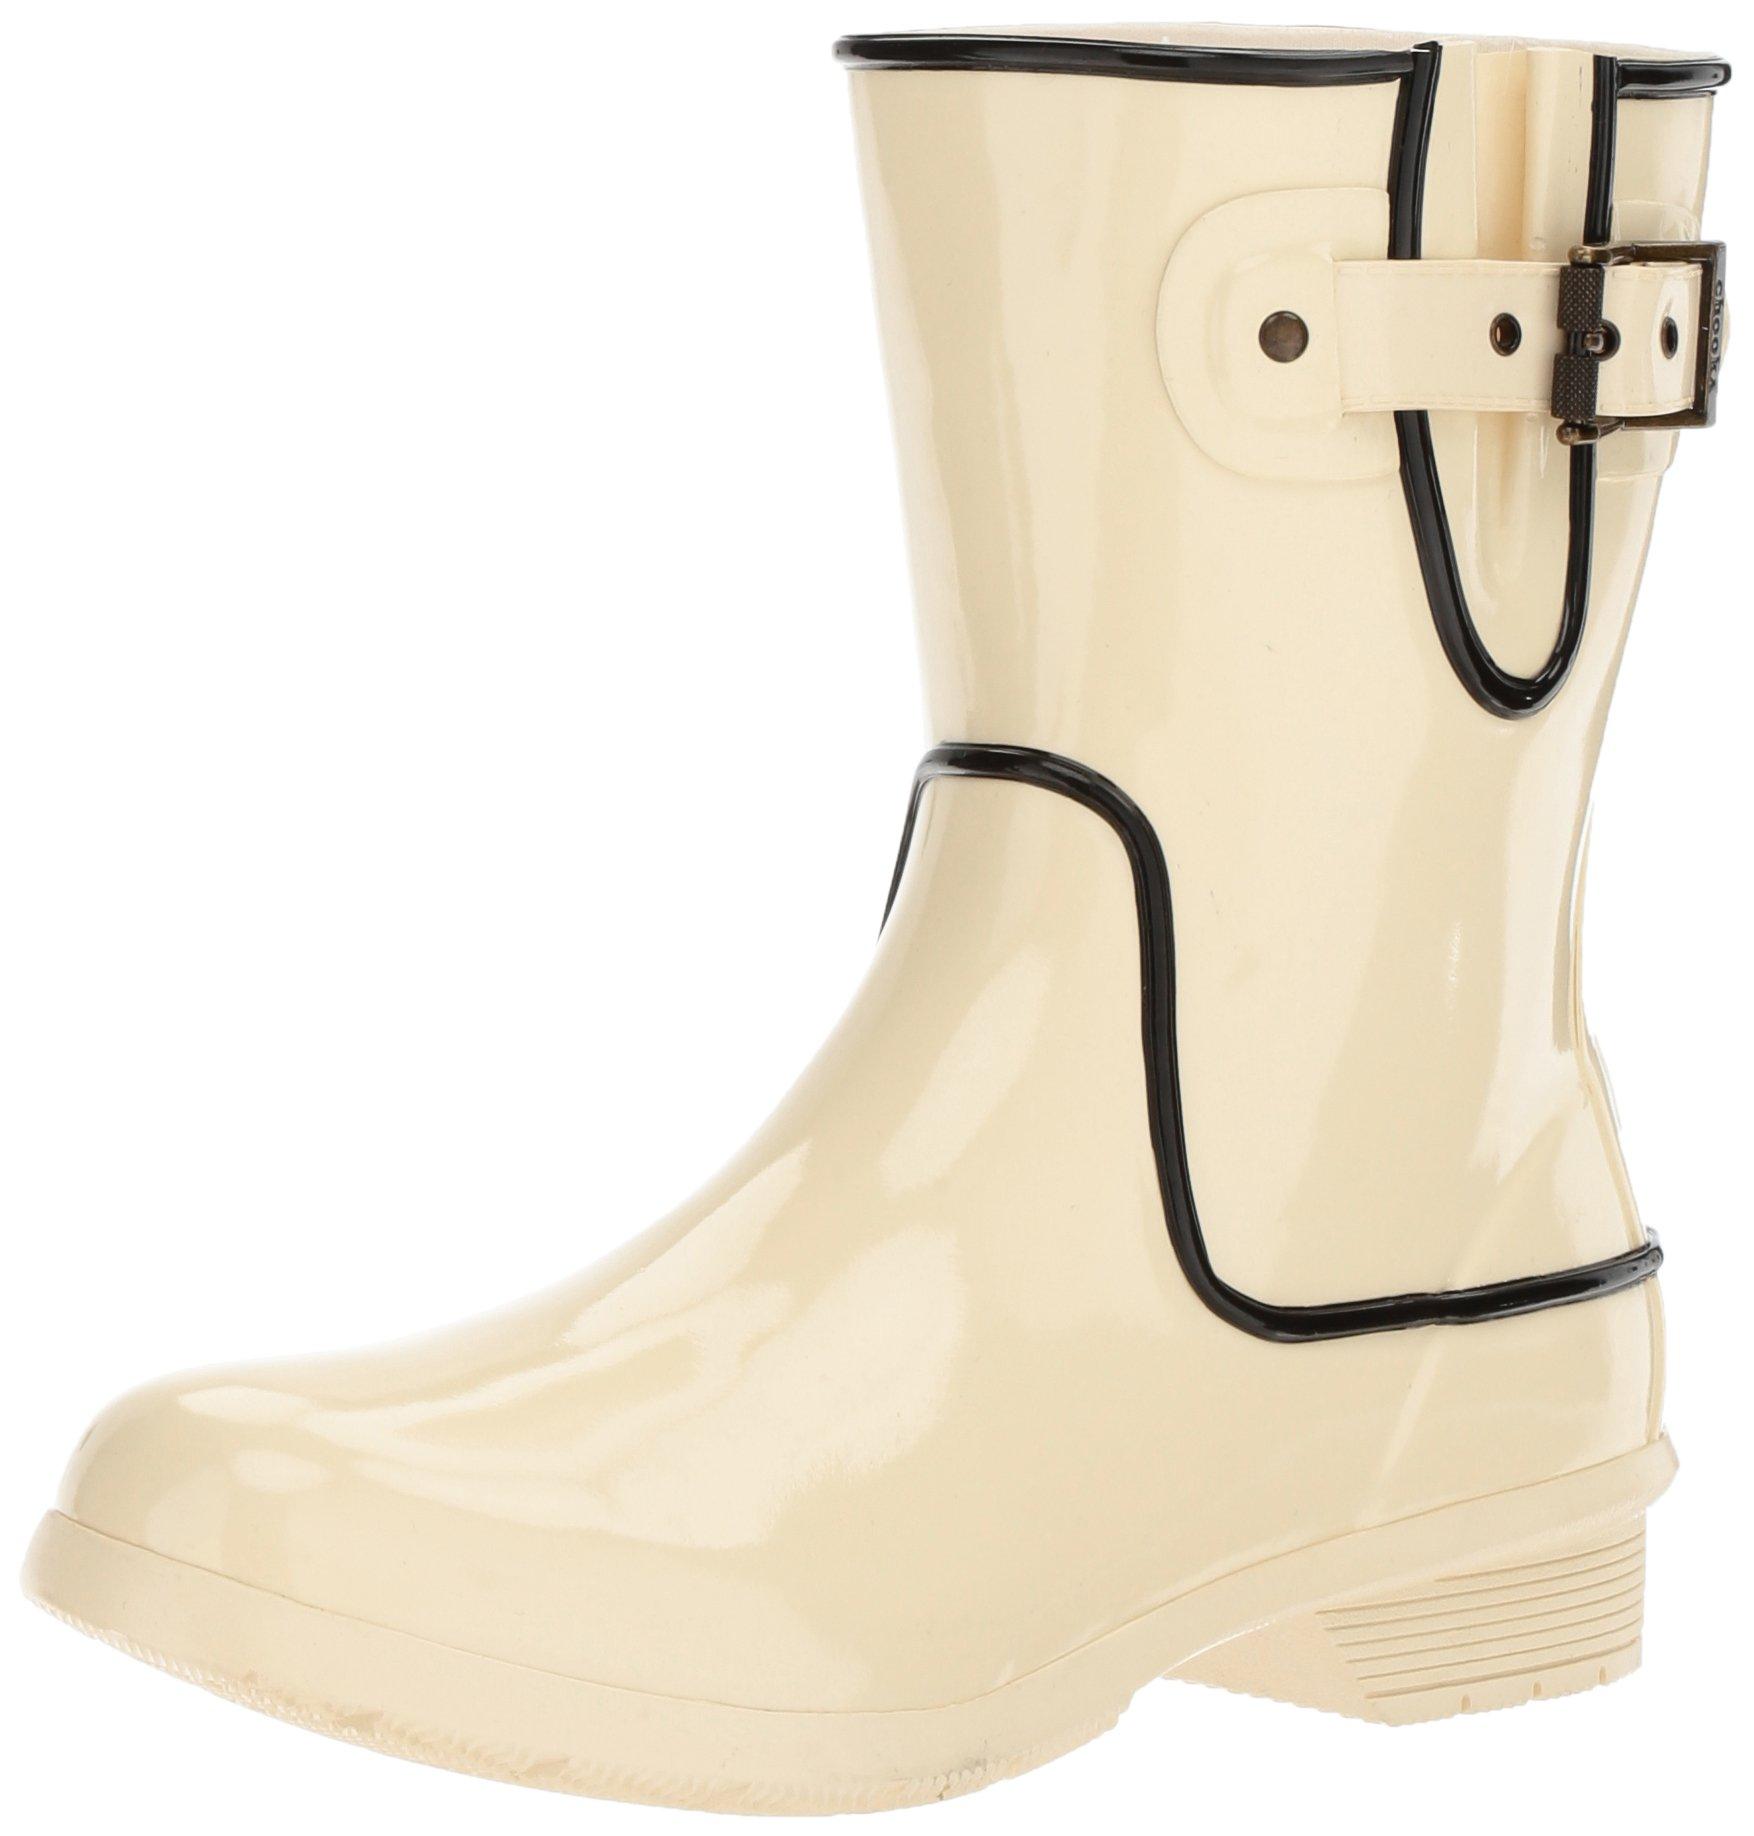 Chooka Women's Waterproof Mid-Height Printed Memory Foam Rain Boot, Fine Line Ivory, 8 M US